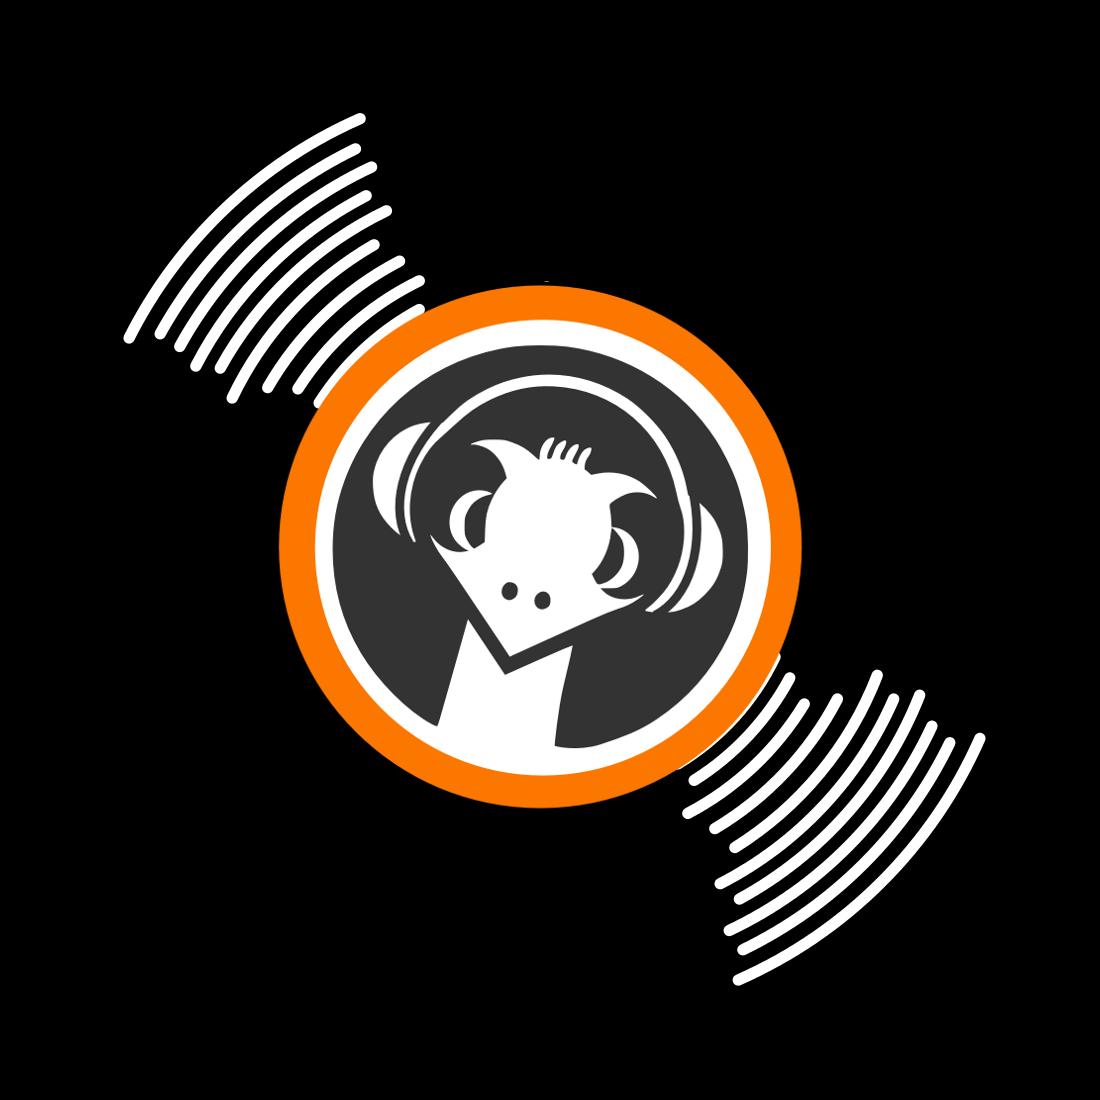 [sub26nico] Les joutes de LinuxMAO.org